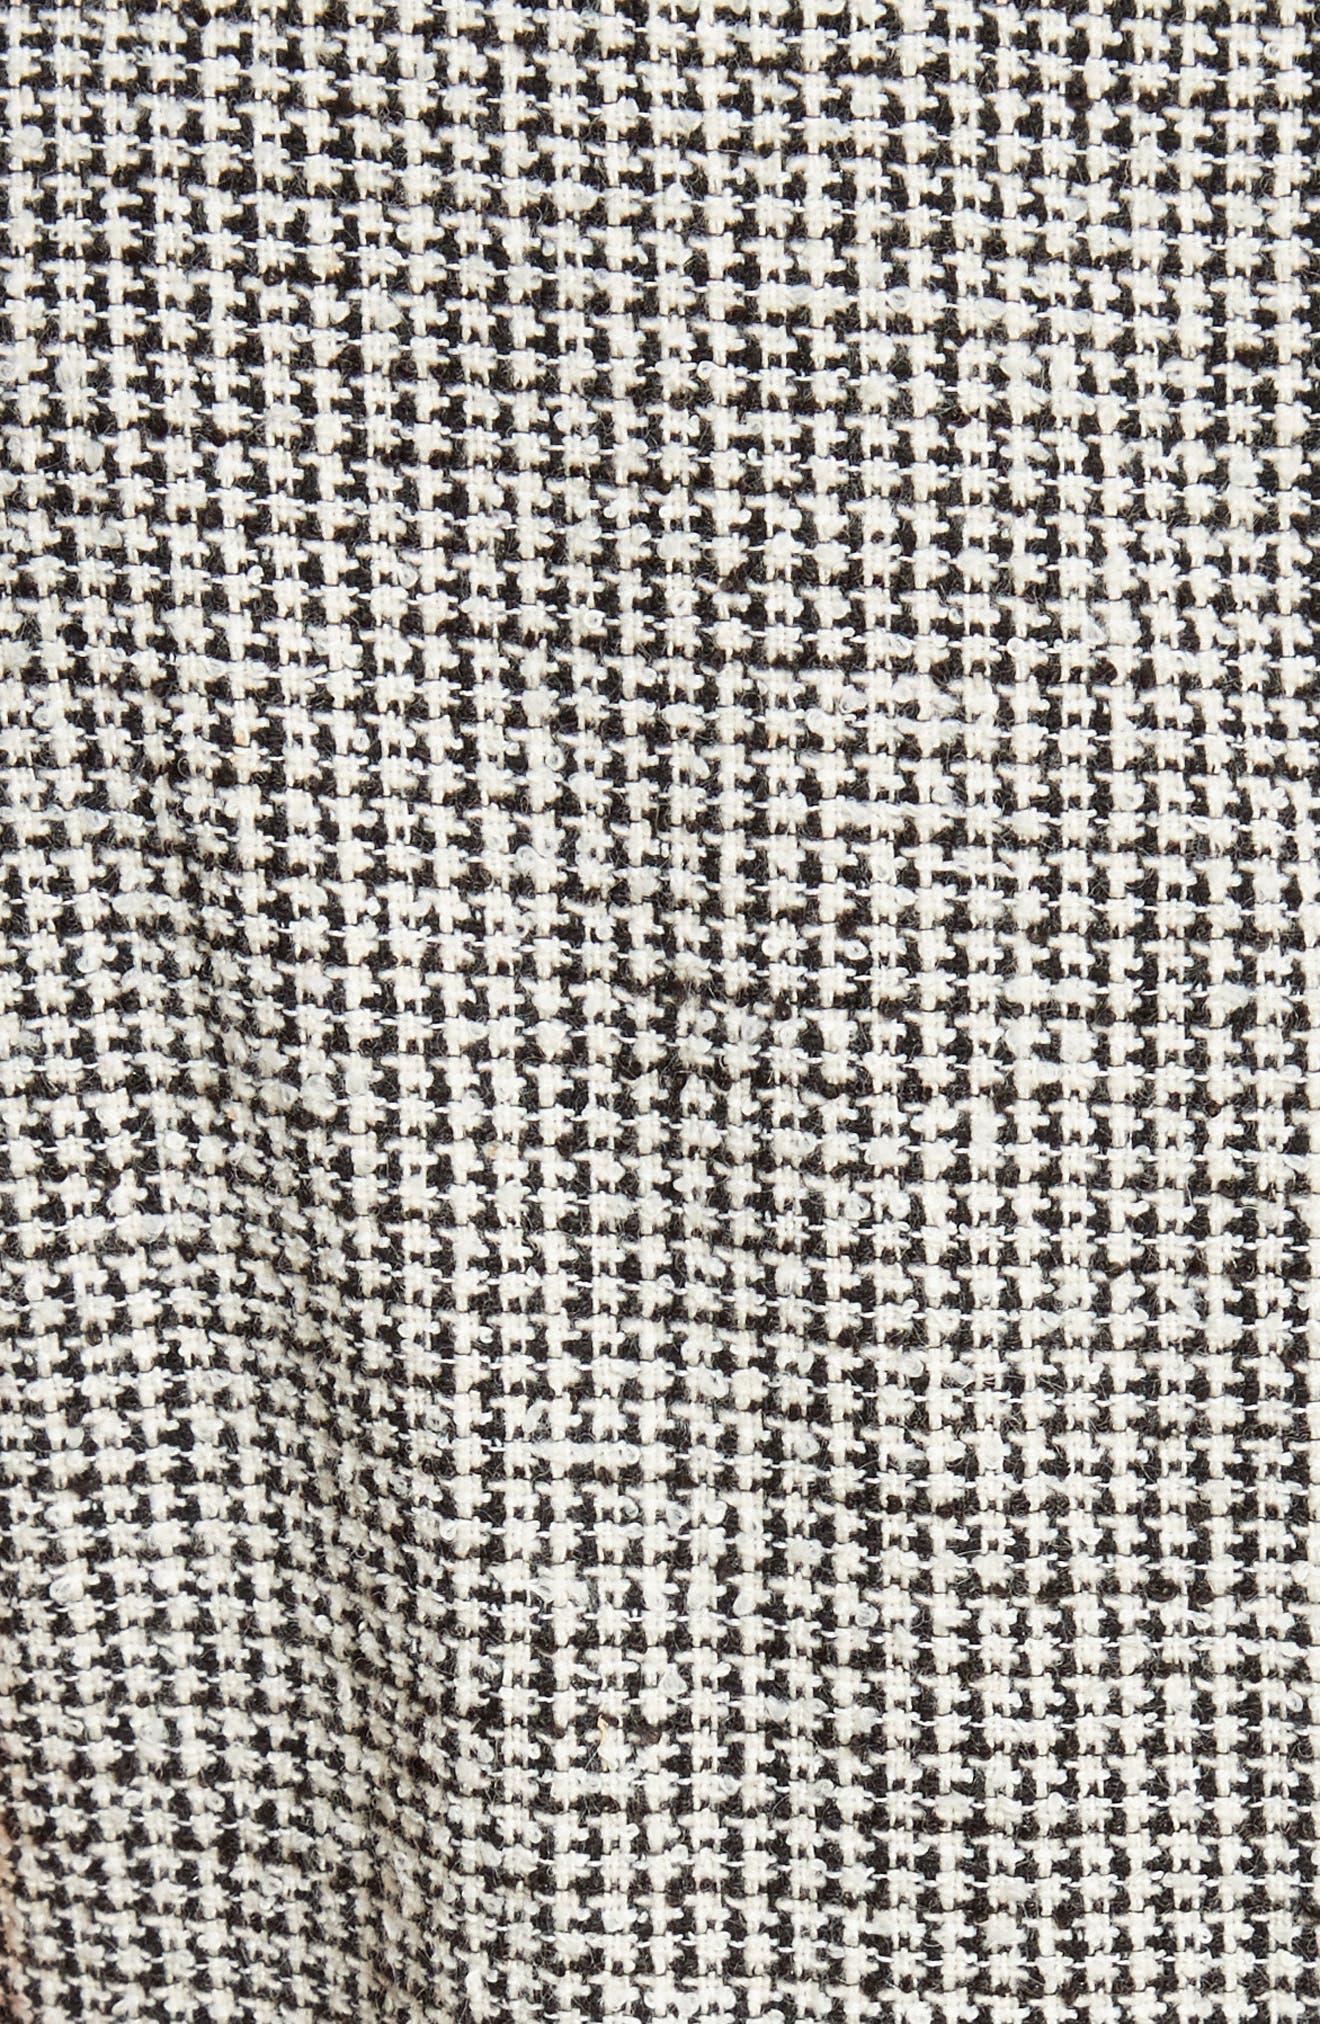 Coley Mock Neck Dress,                             Alternate thumbnail 5, color,                             Black/ White